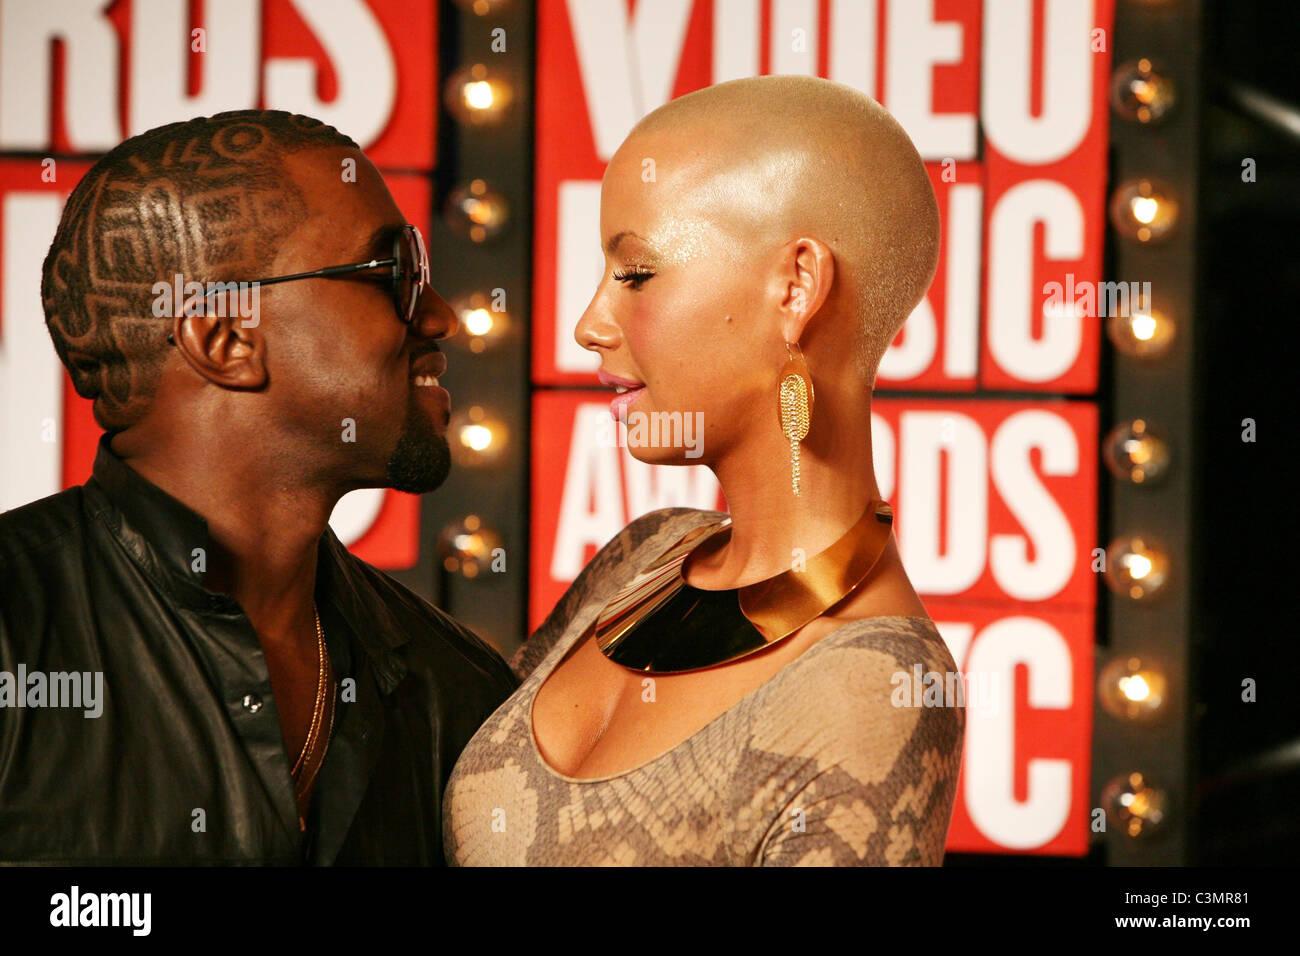 Amber Rose Kanye West Vma